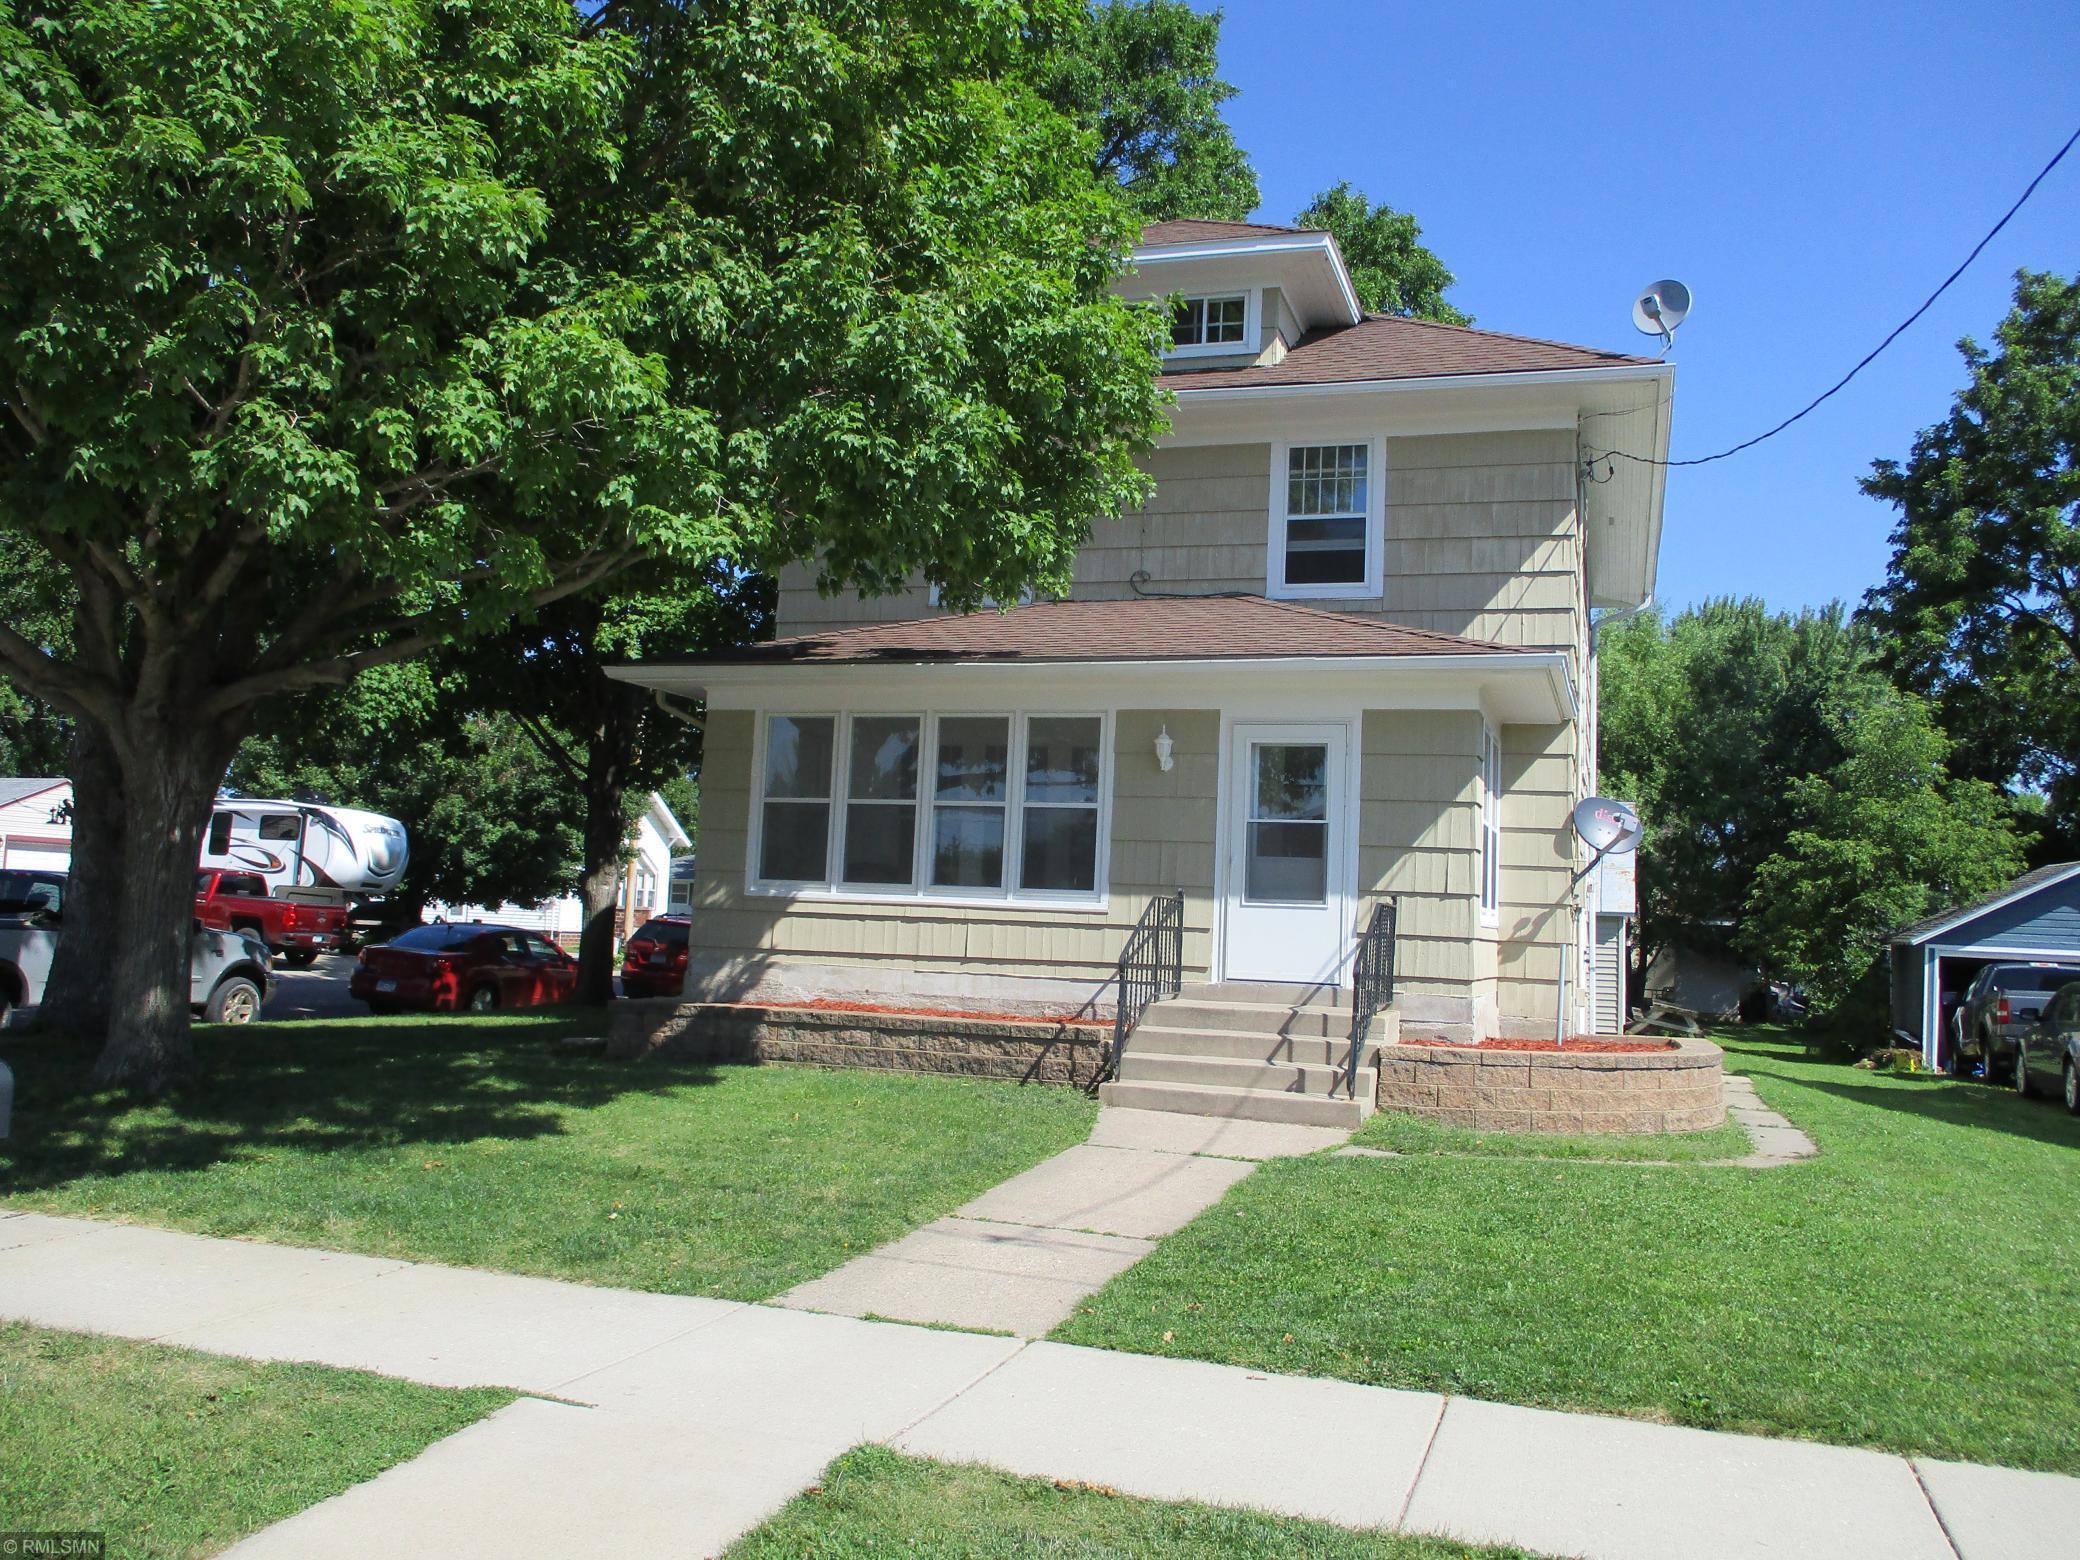 182 W Minnesota Street Property Photo - Le Center, MN real estate listing